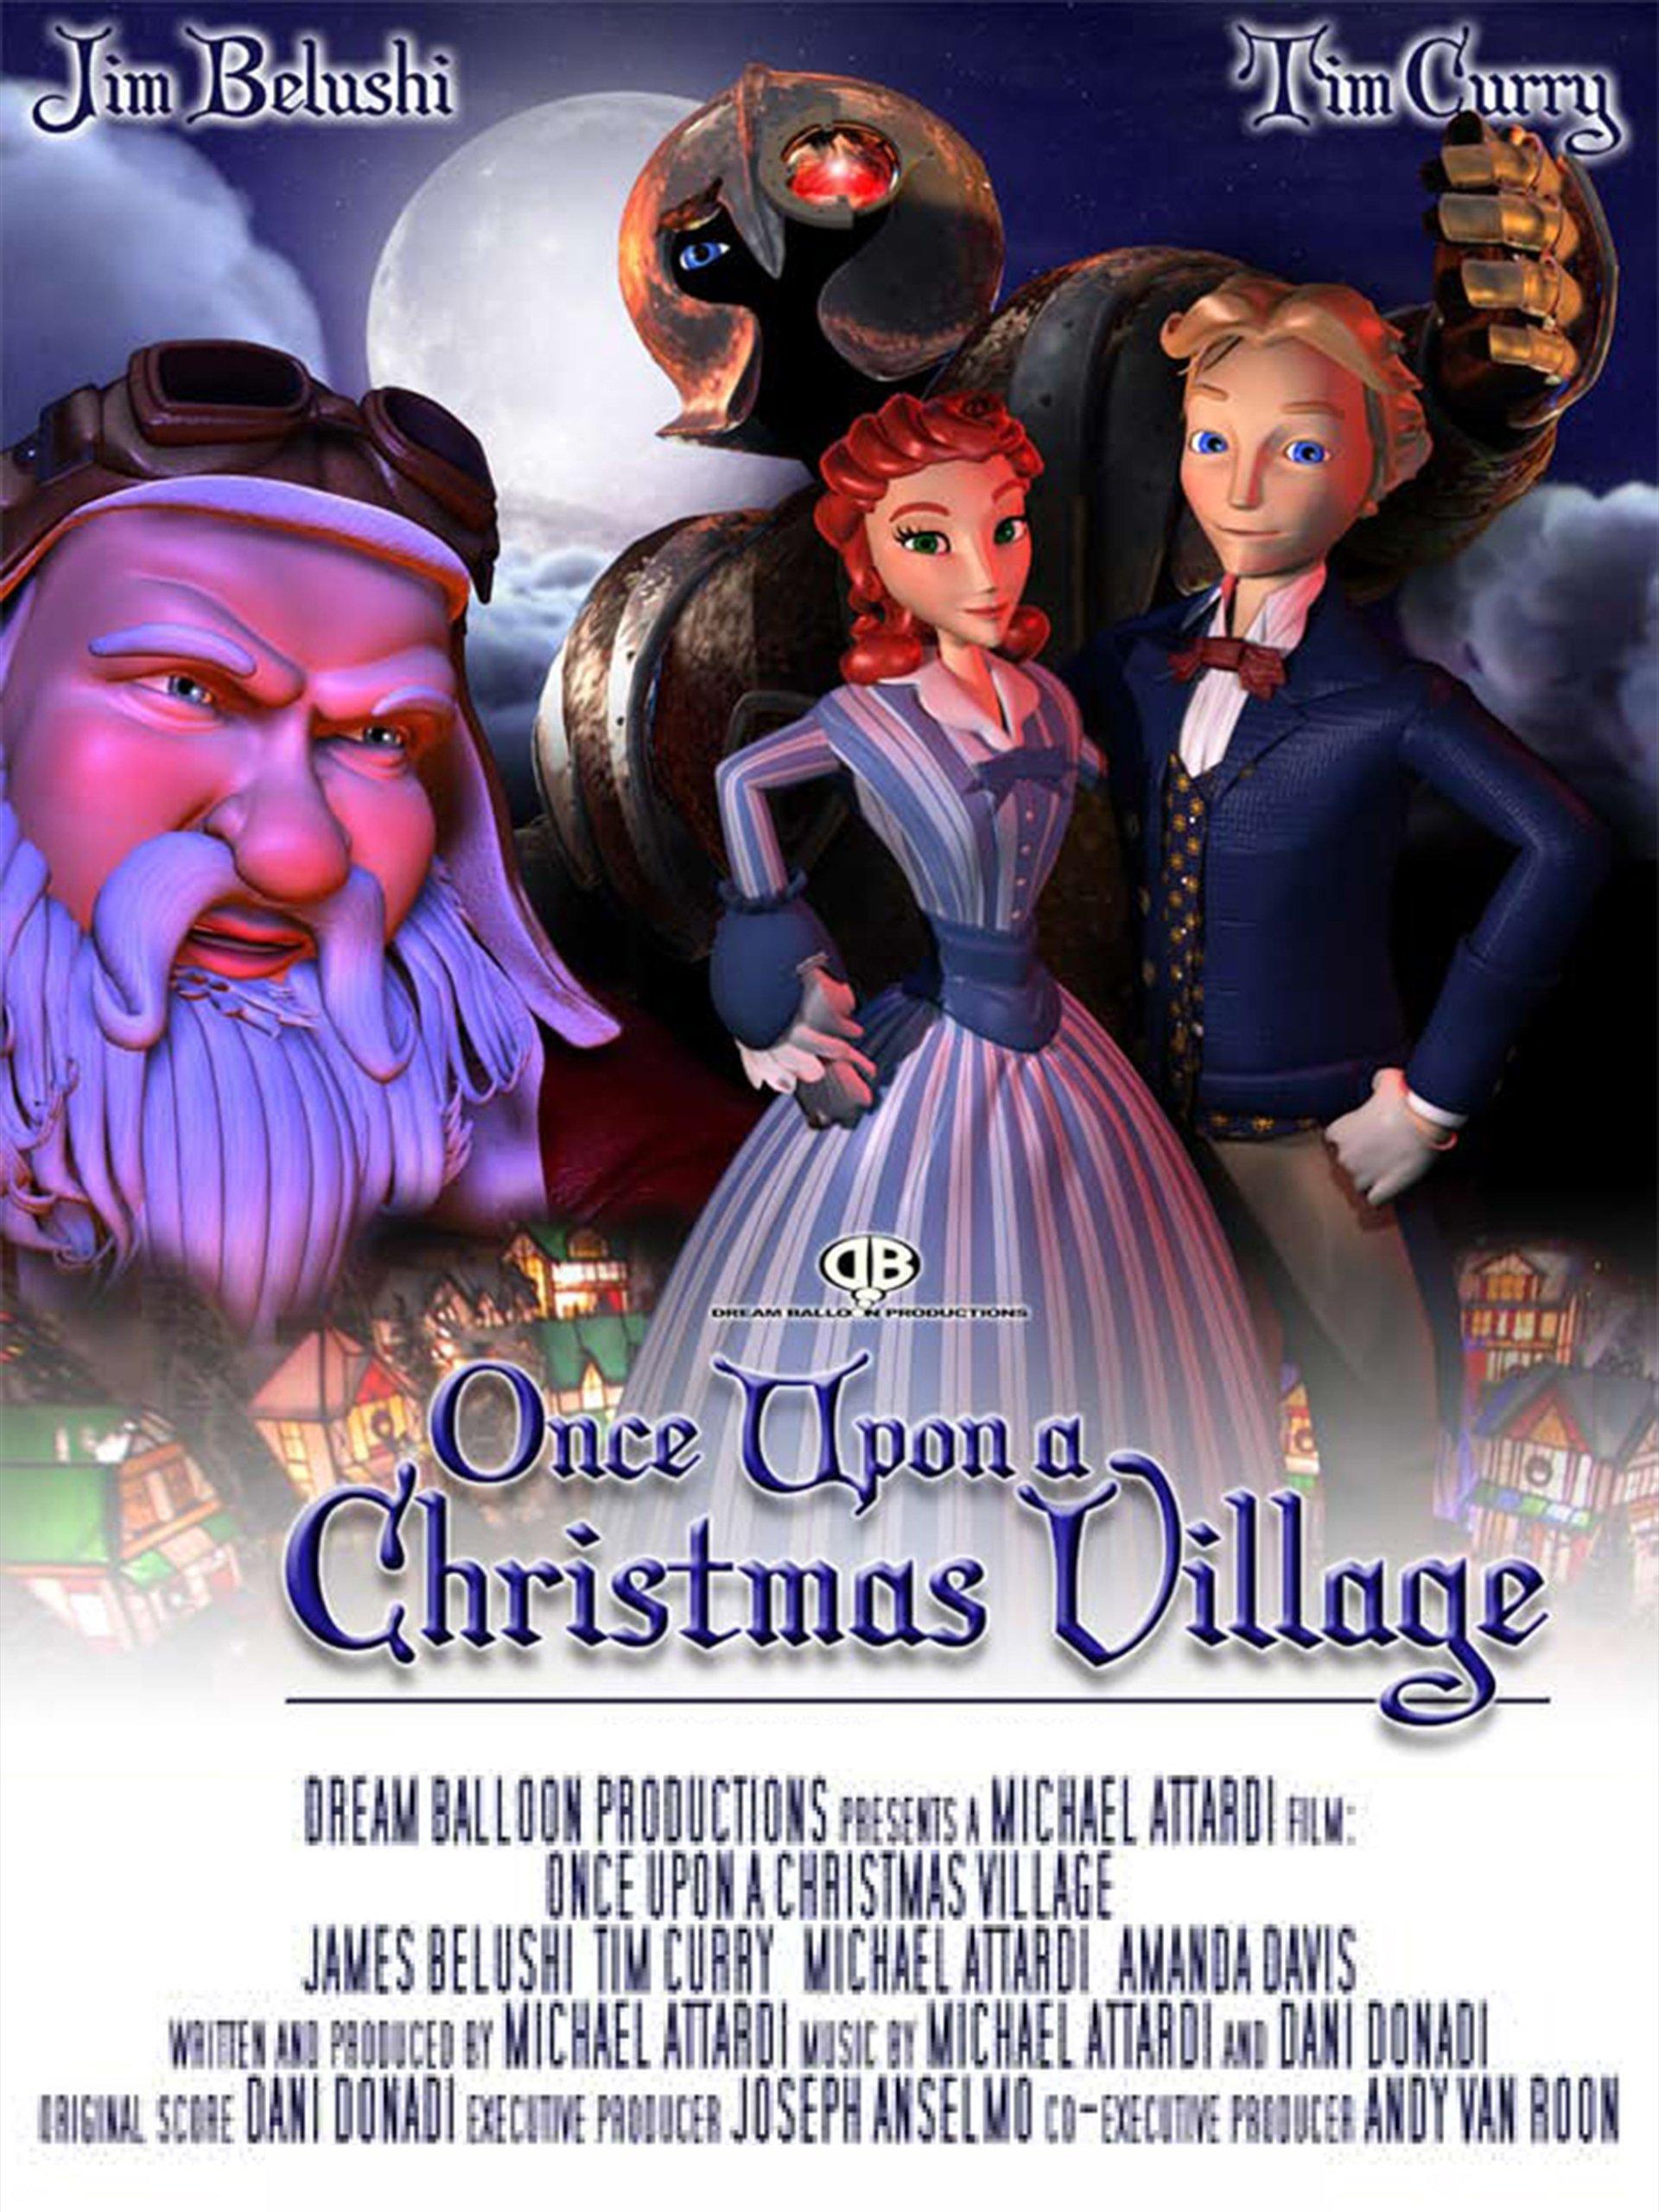 amazoncom once upon a christmas village amanda davis michael attardi jim belushi tim curry - Once Upon A Christmas Full Movie